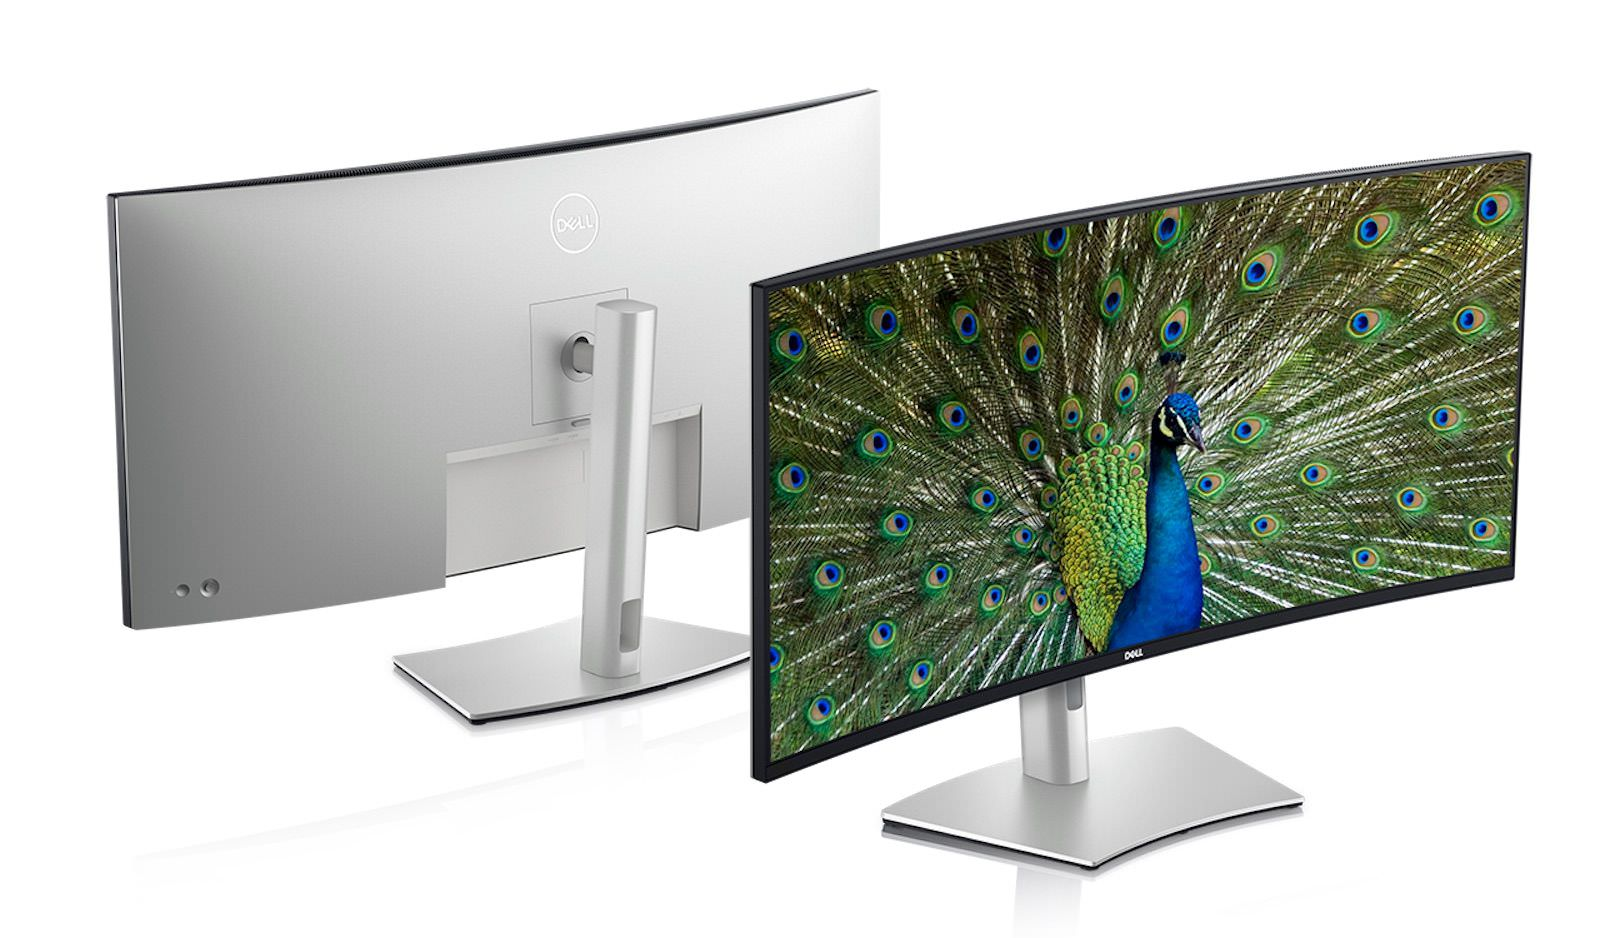 U4021qw UltraSharp 40 Curved WUHD Monitor 1280x750 1